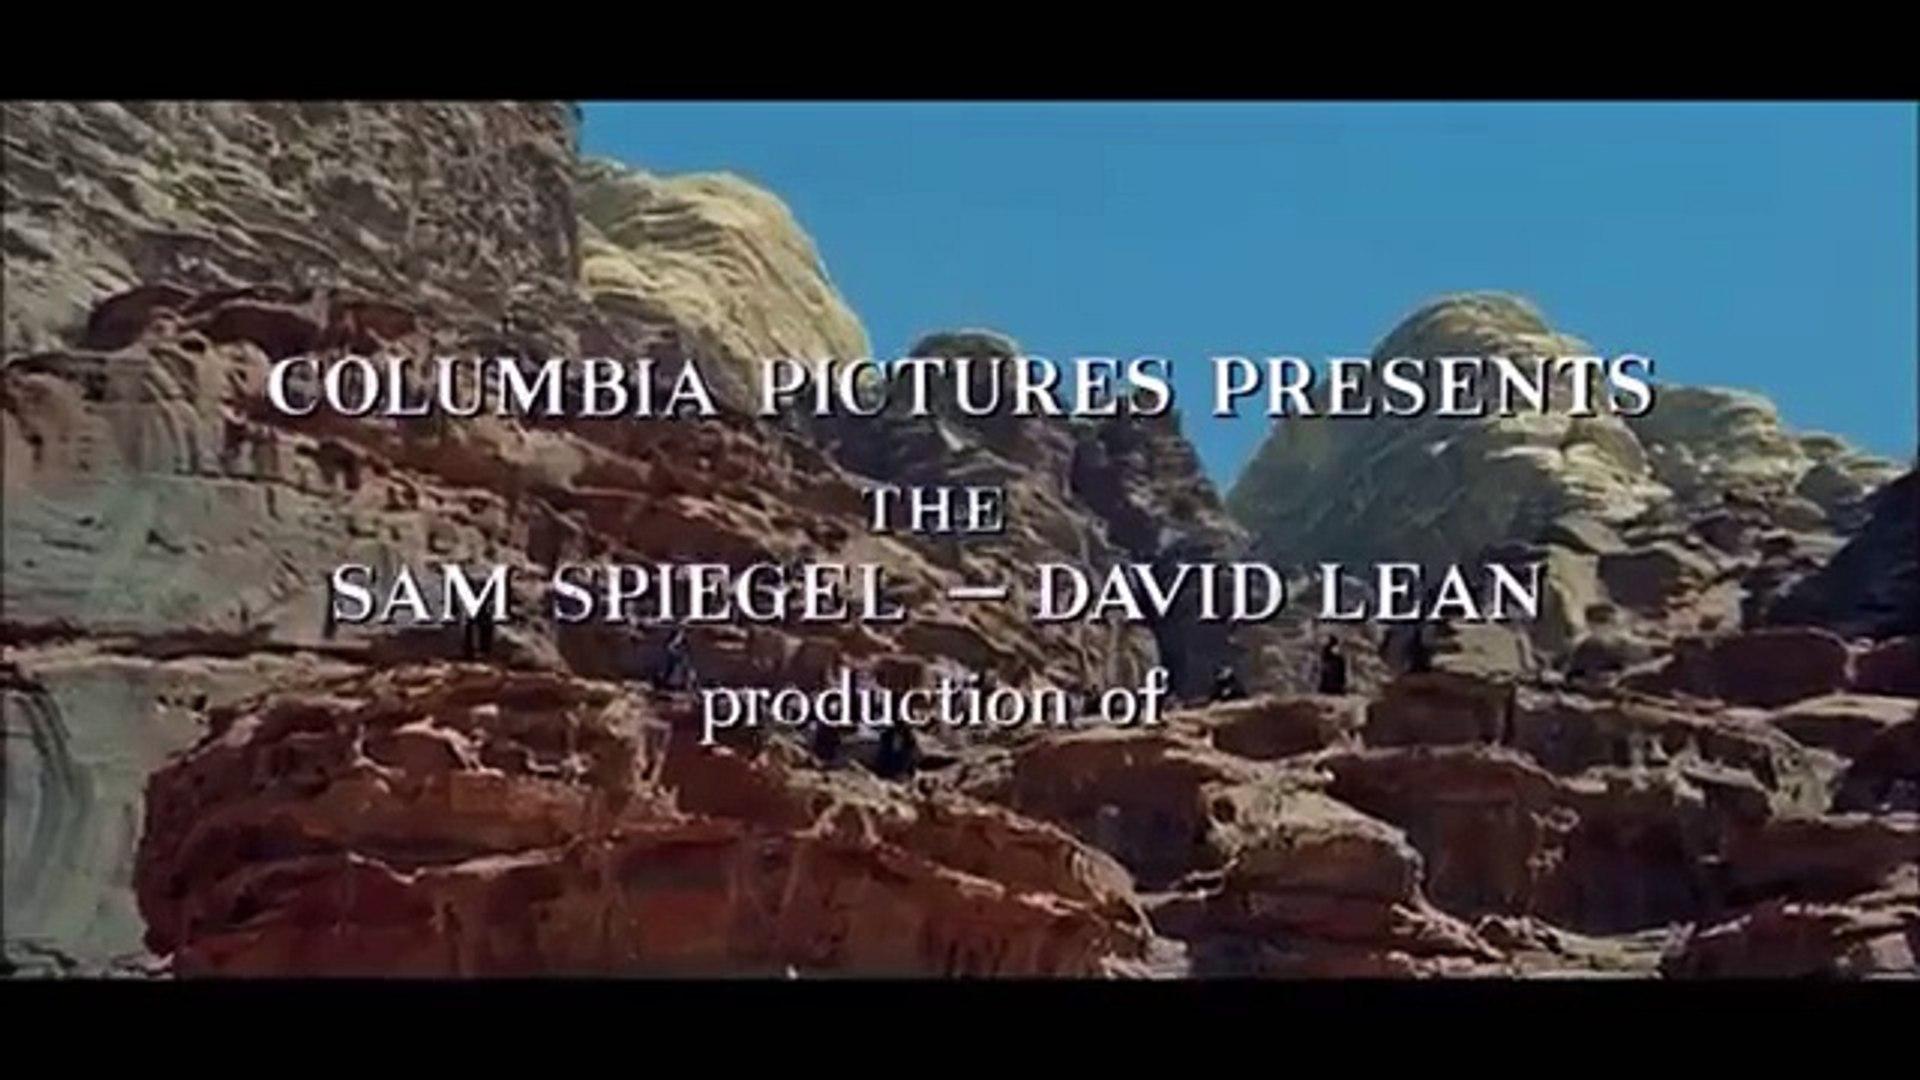 LAWRENCE OF ARABIA (1962) Original Theatrical Trailer, David Lean, Peter O'Toole, Omar Shariff